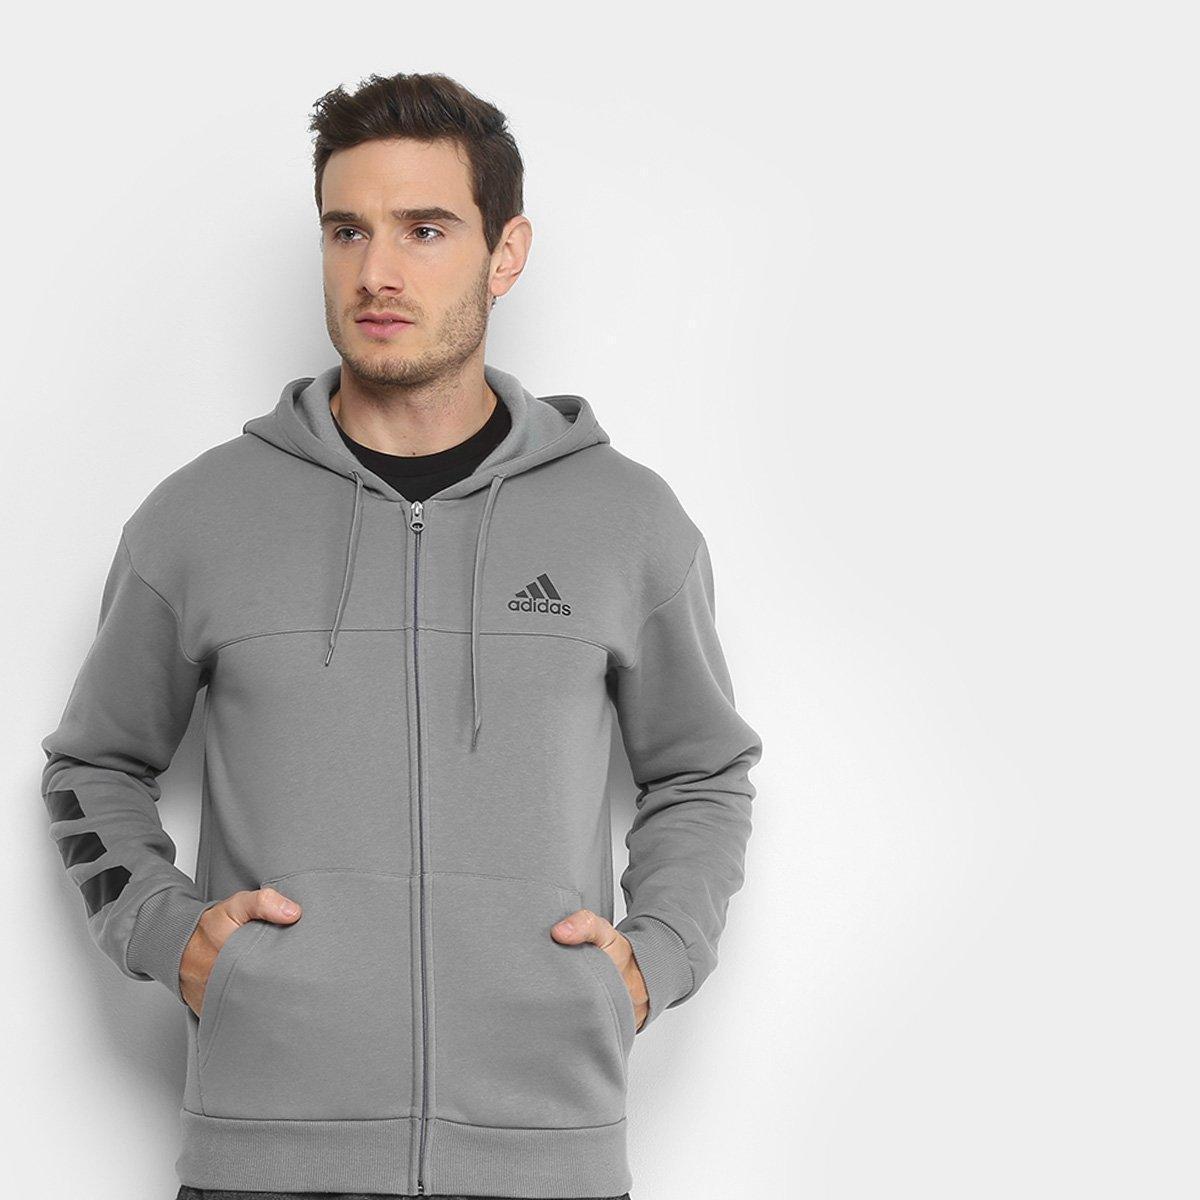 5c713e6907c Jaqueta de Moletom Adidas Sport Full Zip Masculina - Cinza - Compre Agora